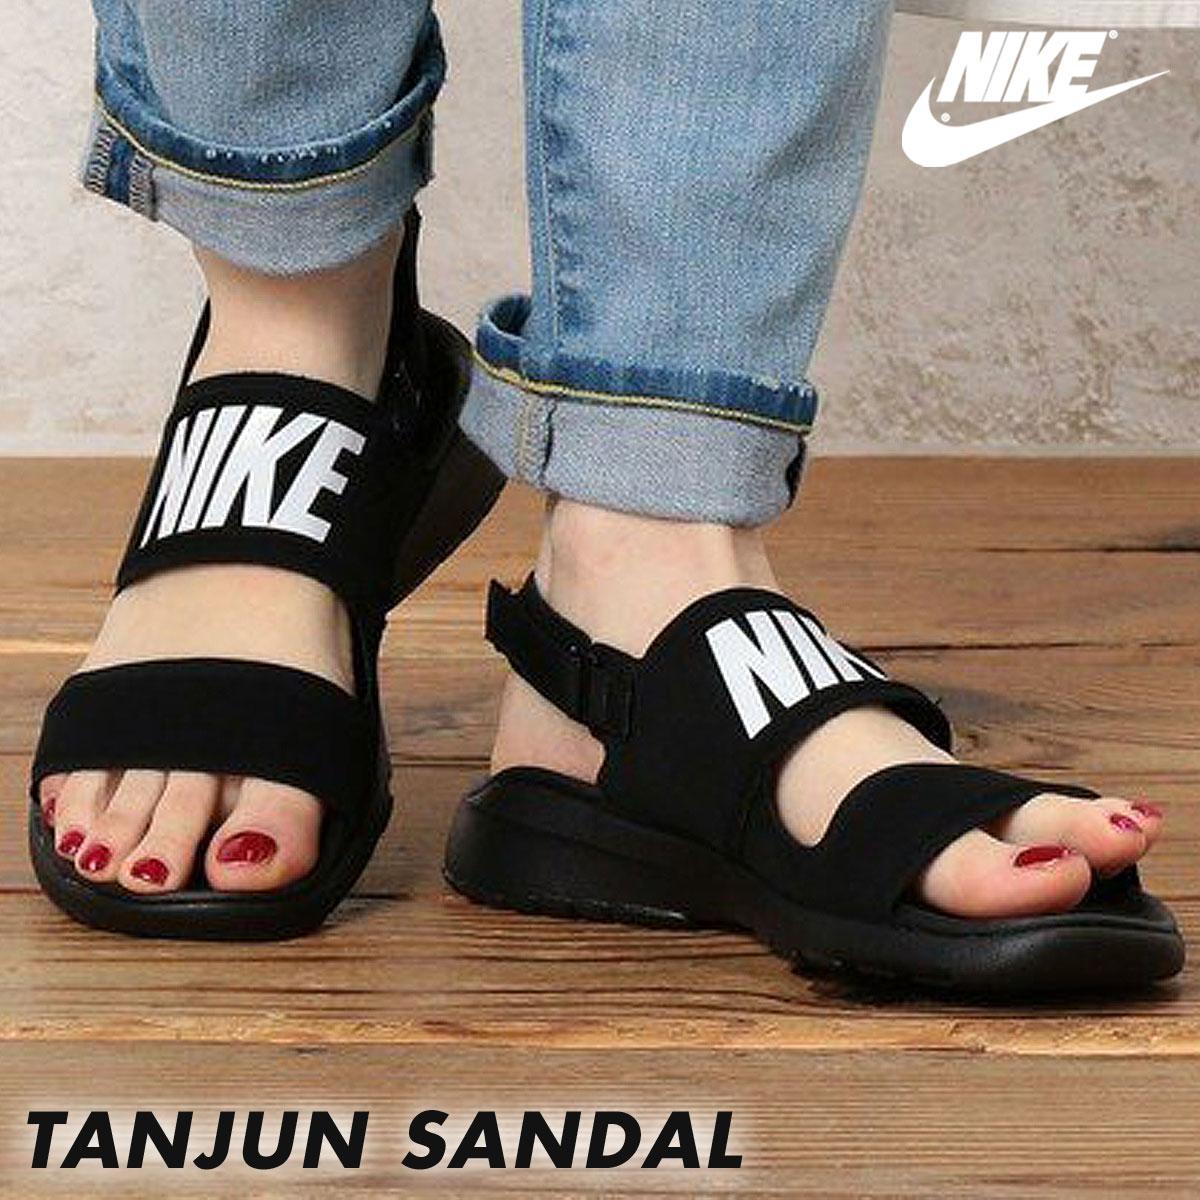 size 40 0c188 2ff1d ... Nike NIKE sandals tongue Jun Lady s sports sandals WMNS TANJUN SANDAL  882,694-001 black black ...